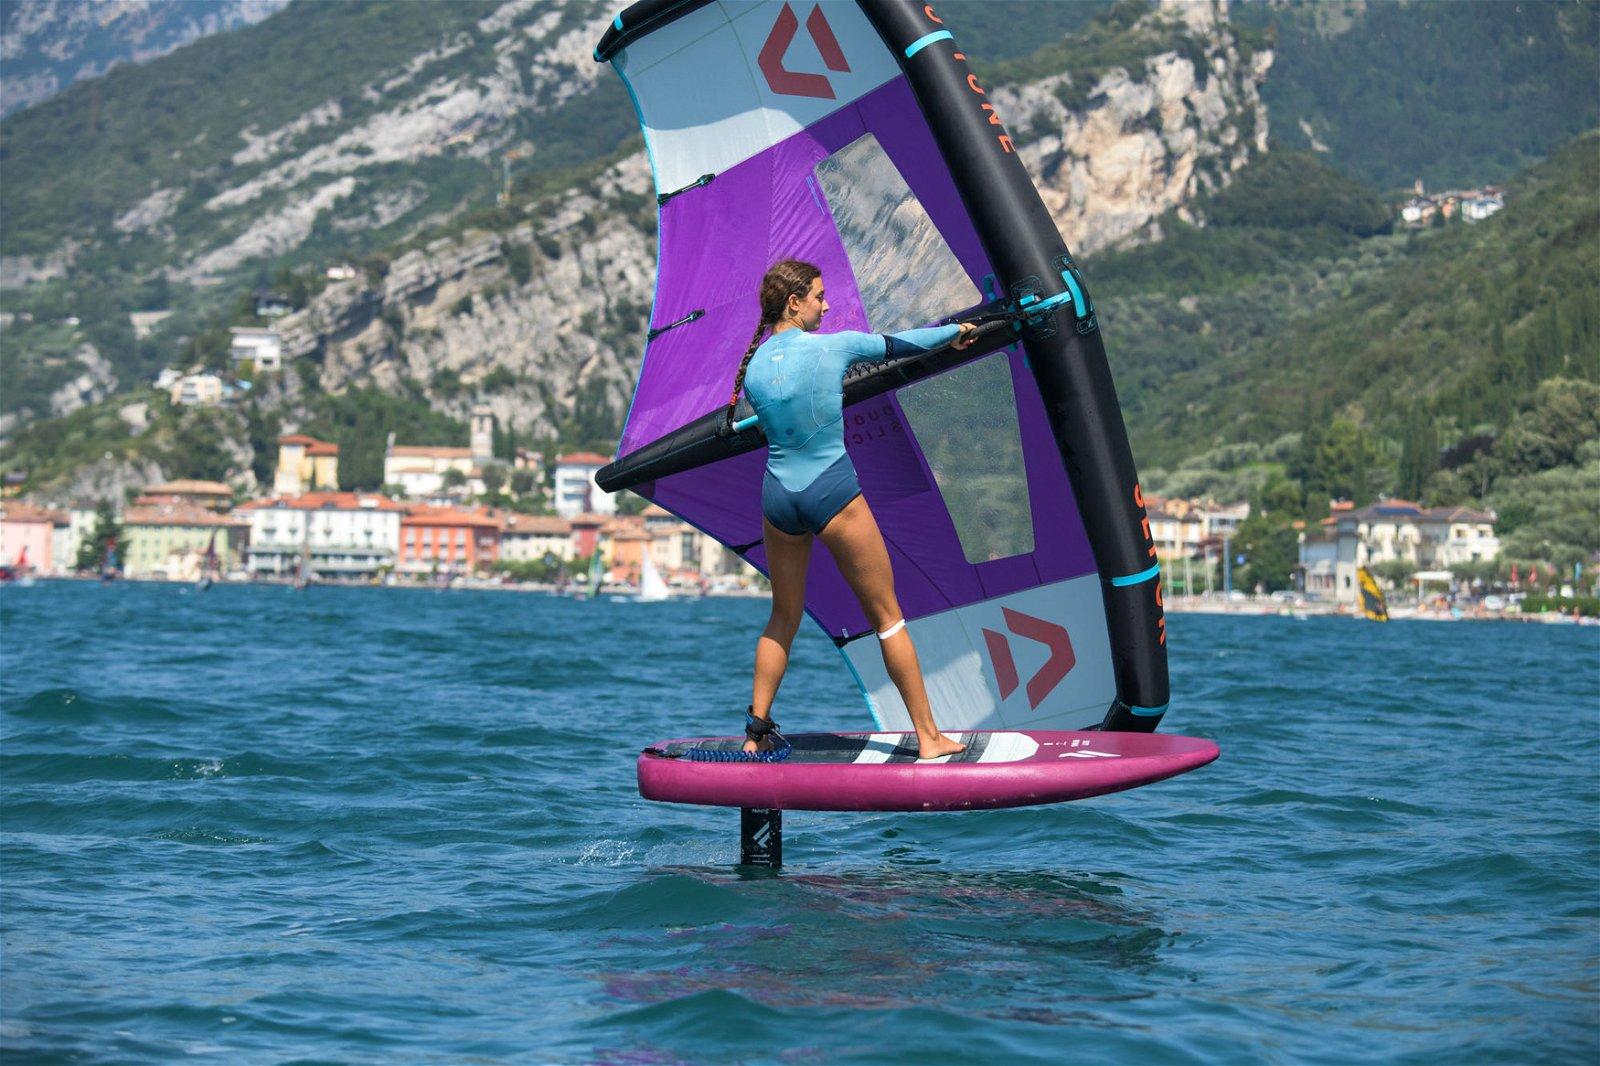 RebeccaSacco Slick21 SkyWingST22 Gardasee by RonnyKiaulehn Fanatic Duotone-3789